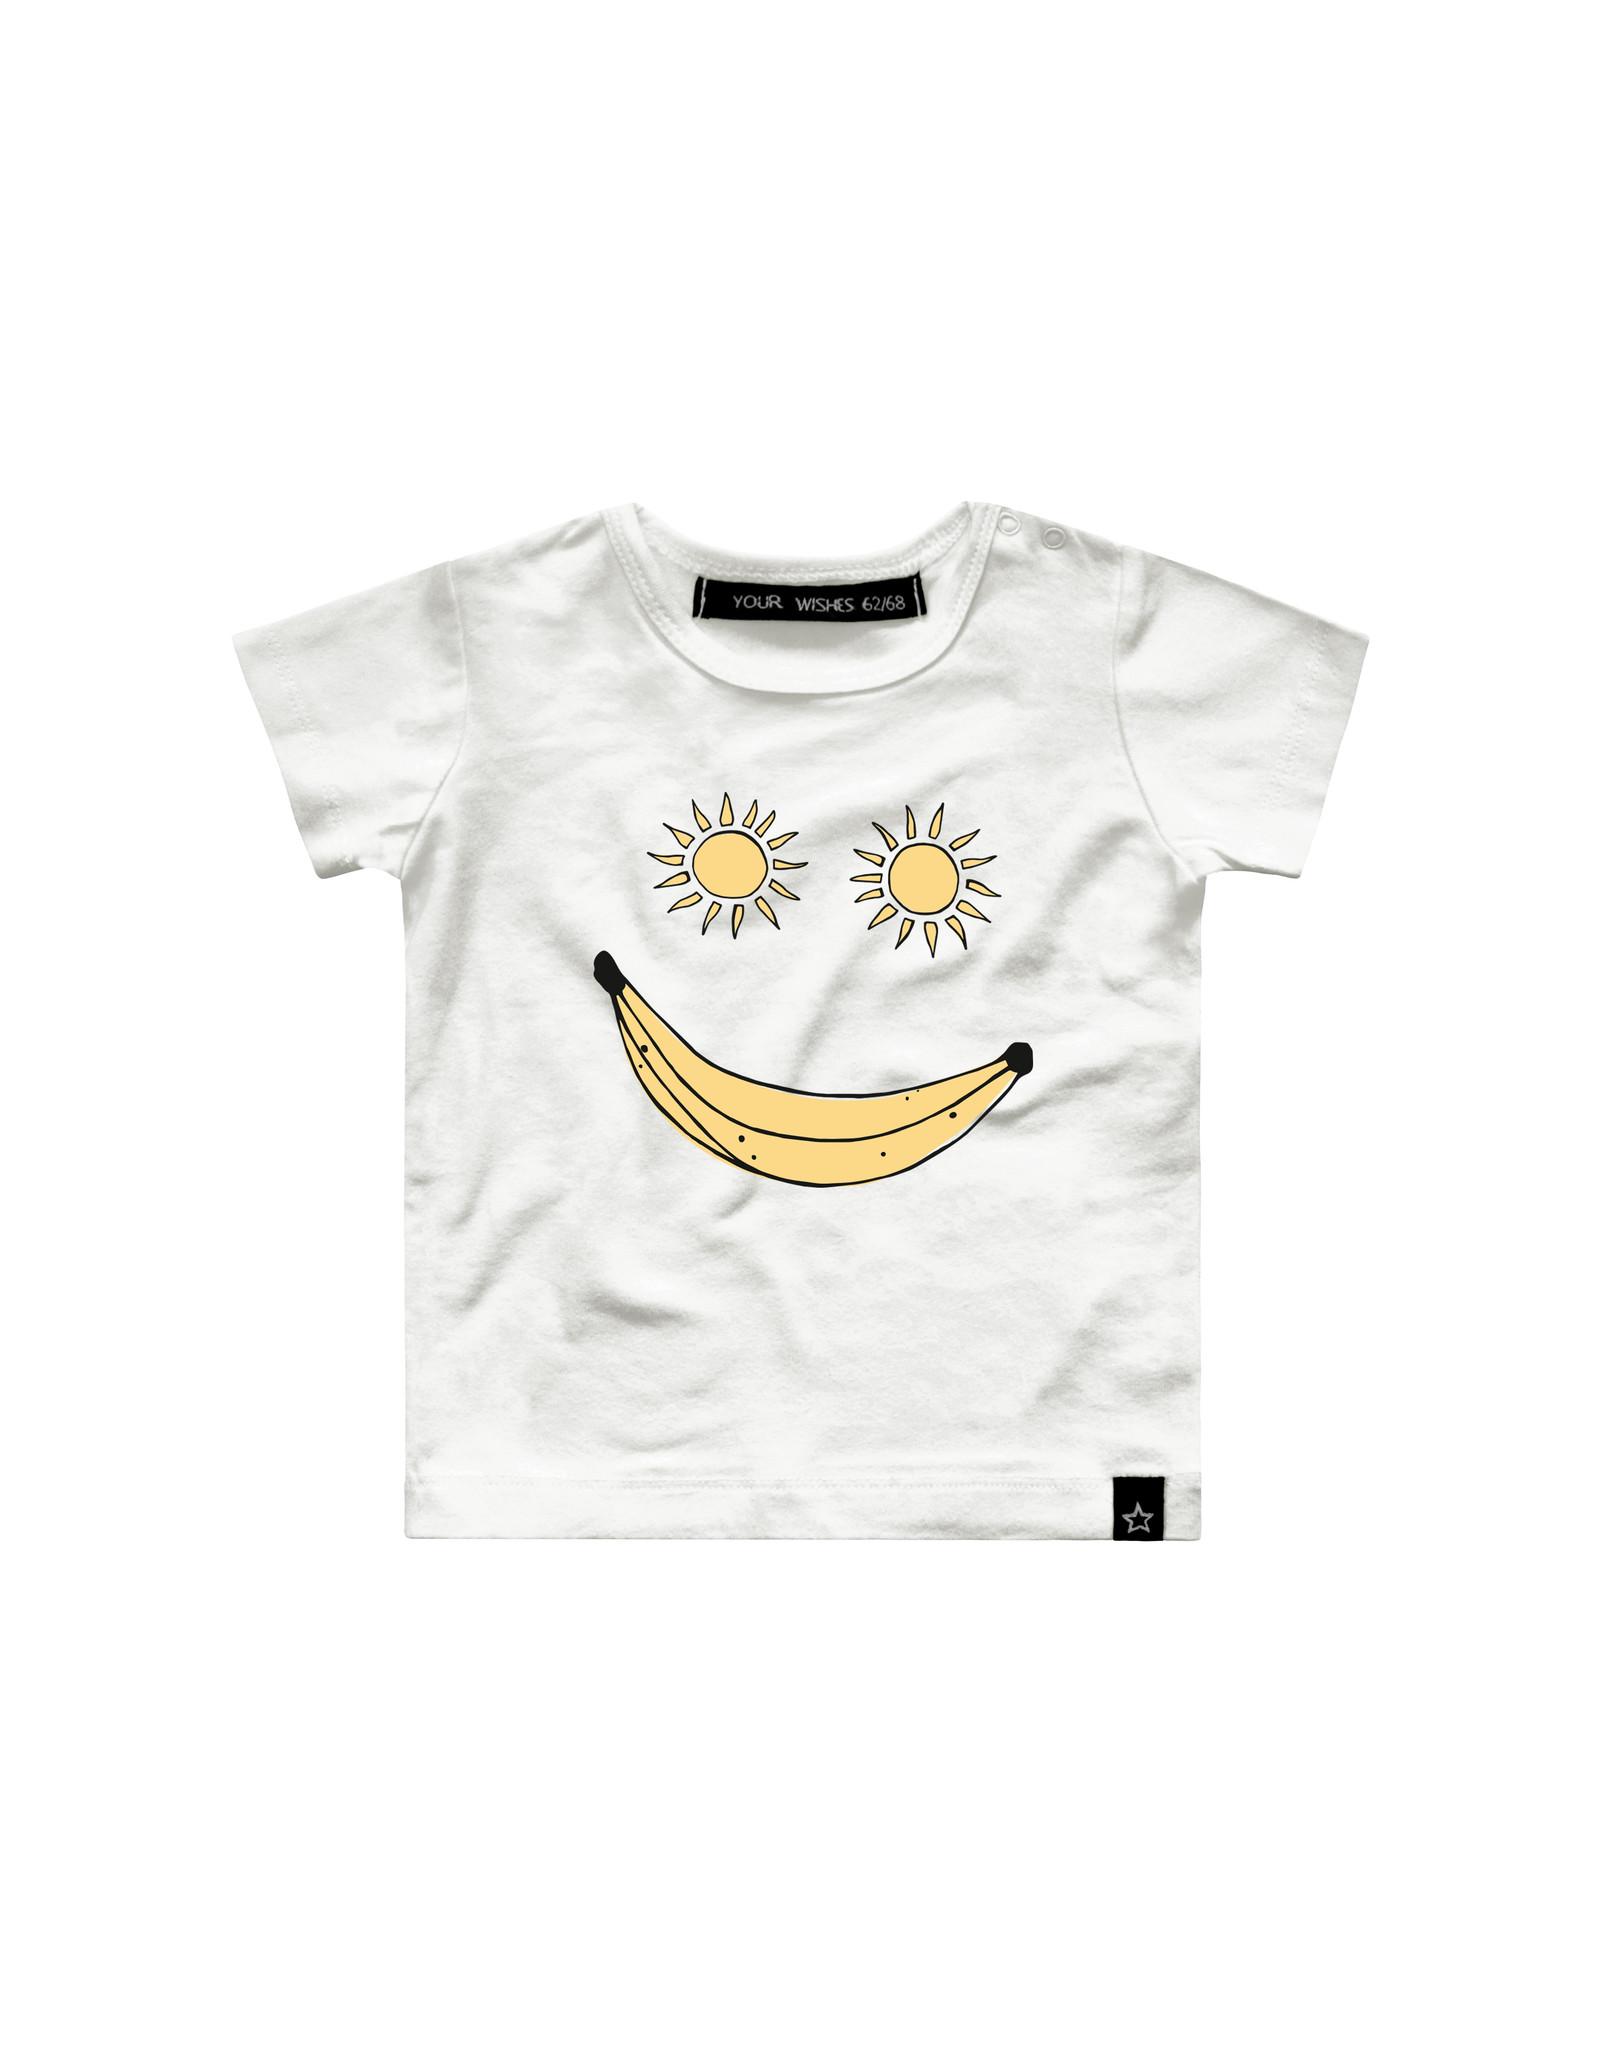 Your Wishes Banana Smile shirt